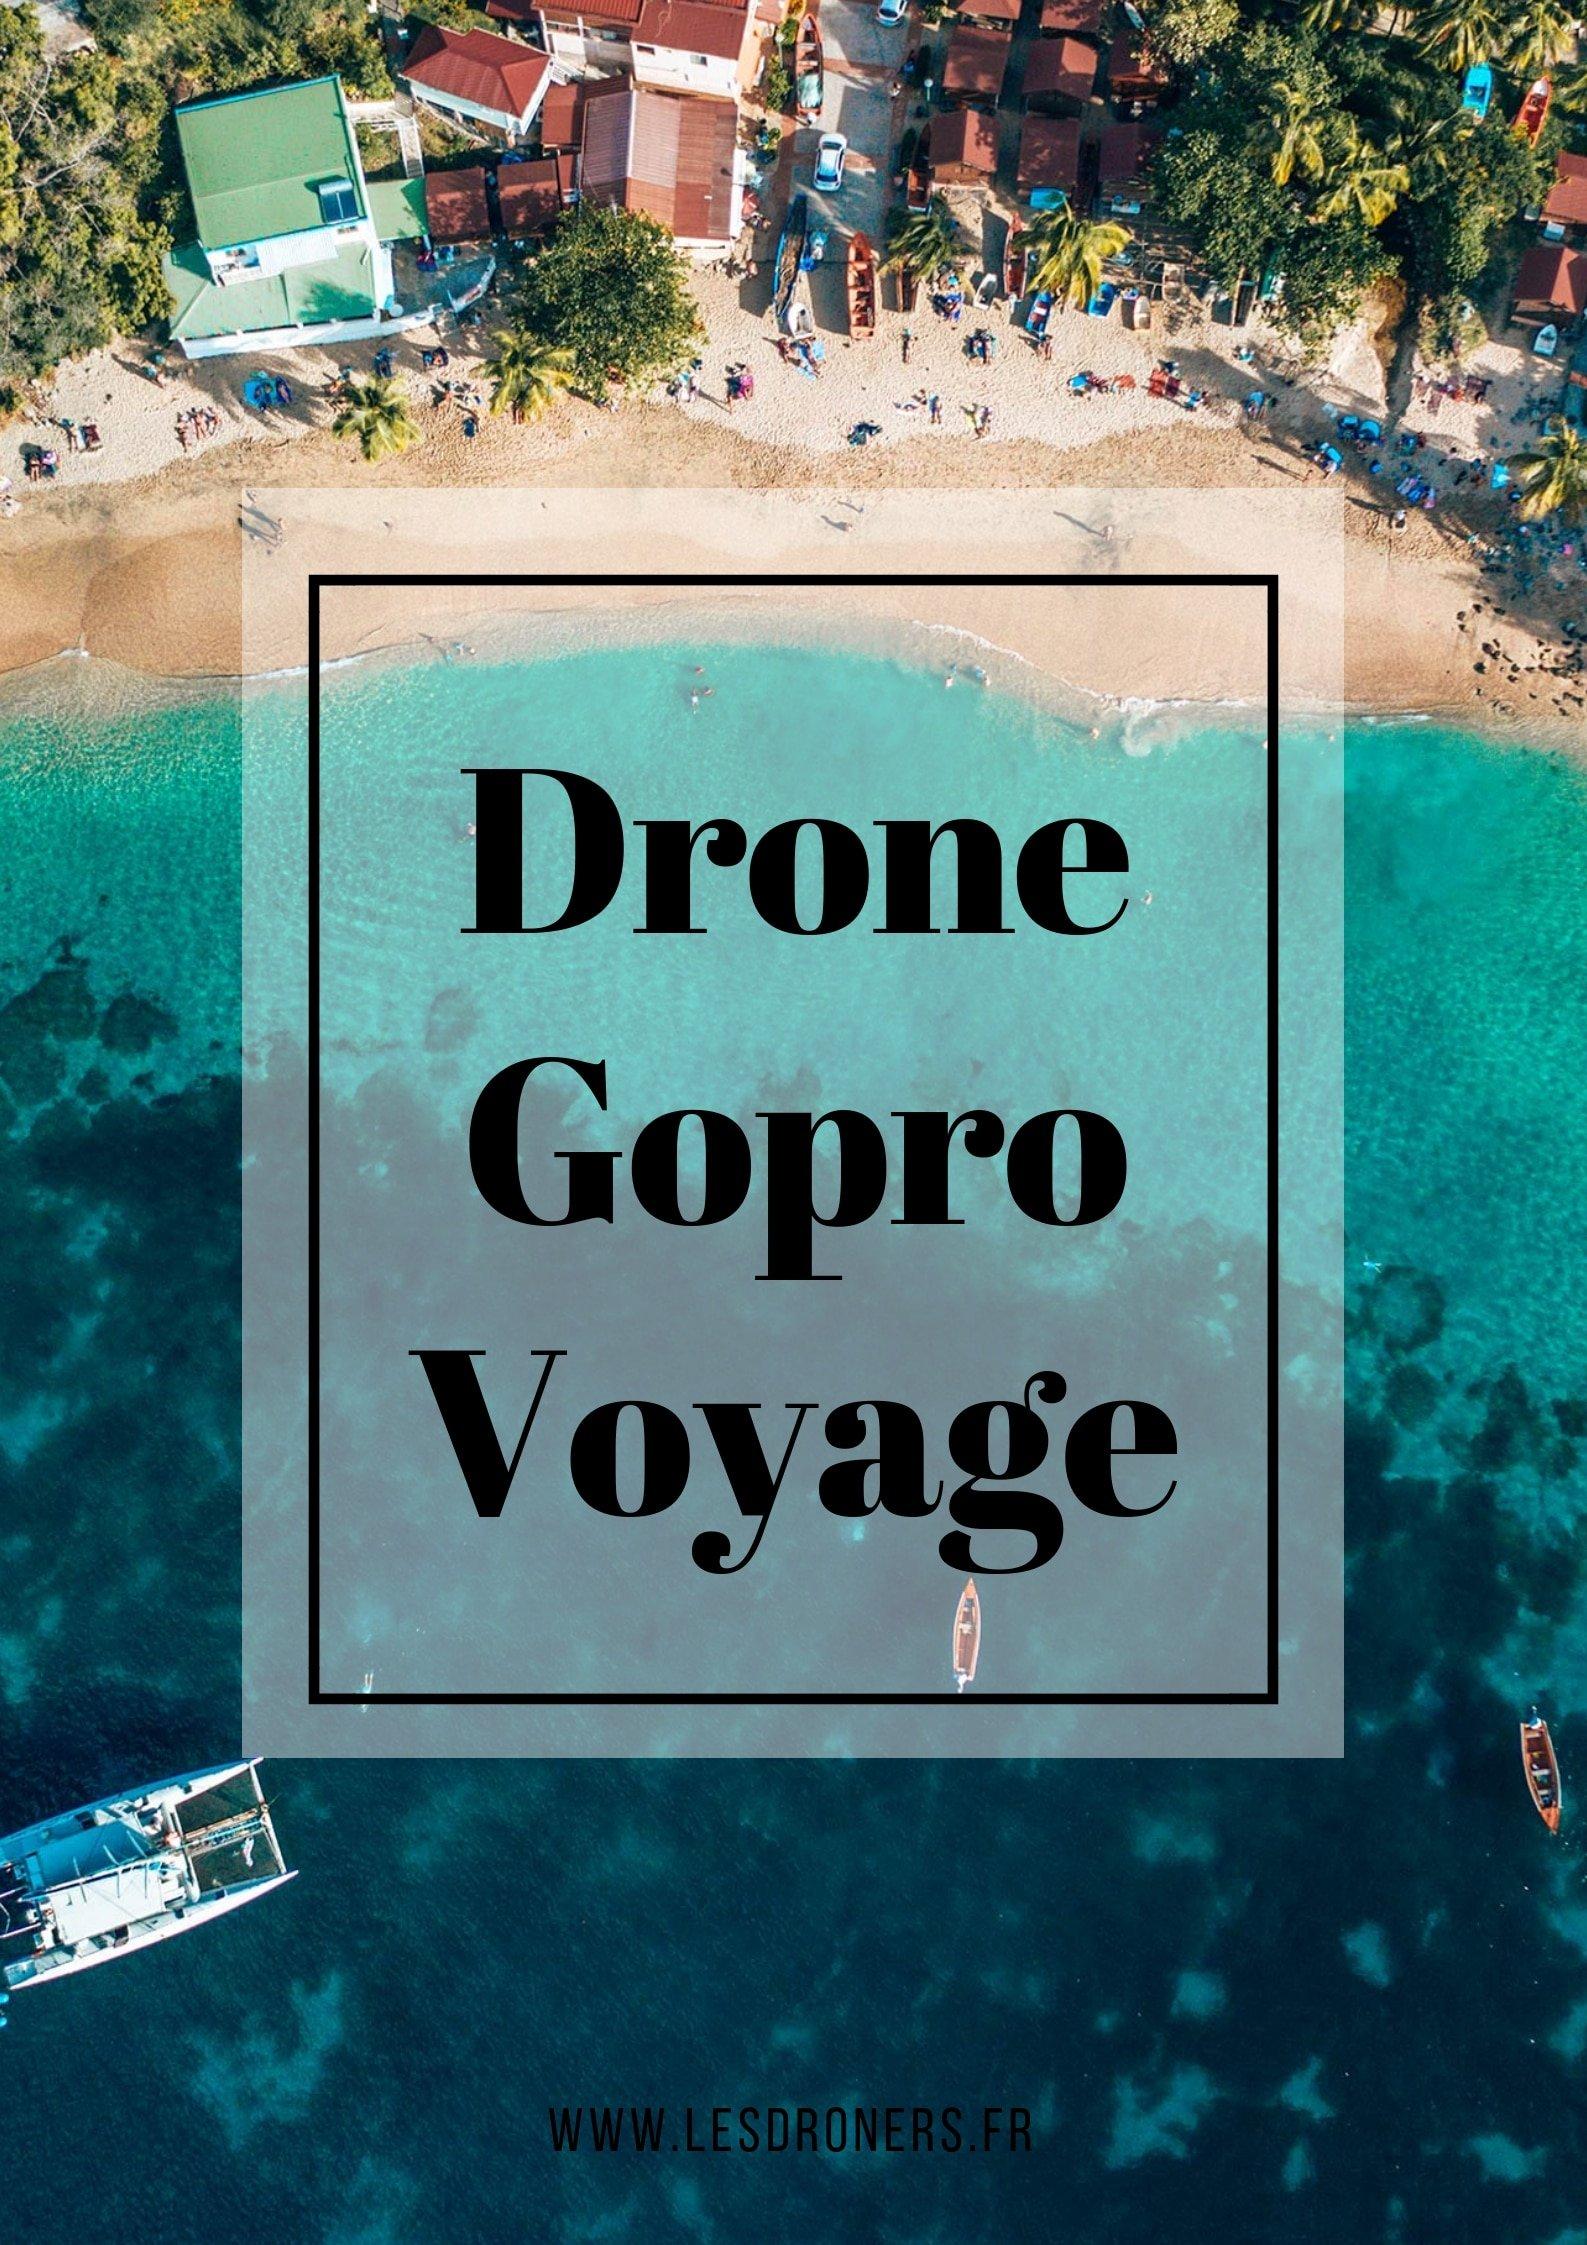 drone gopro voyage